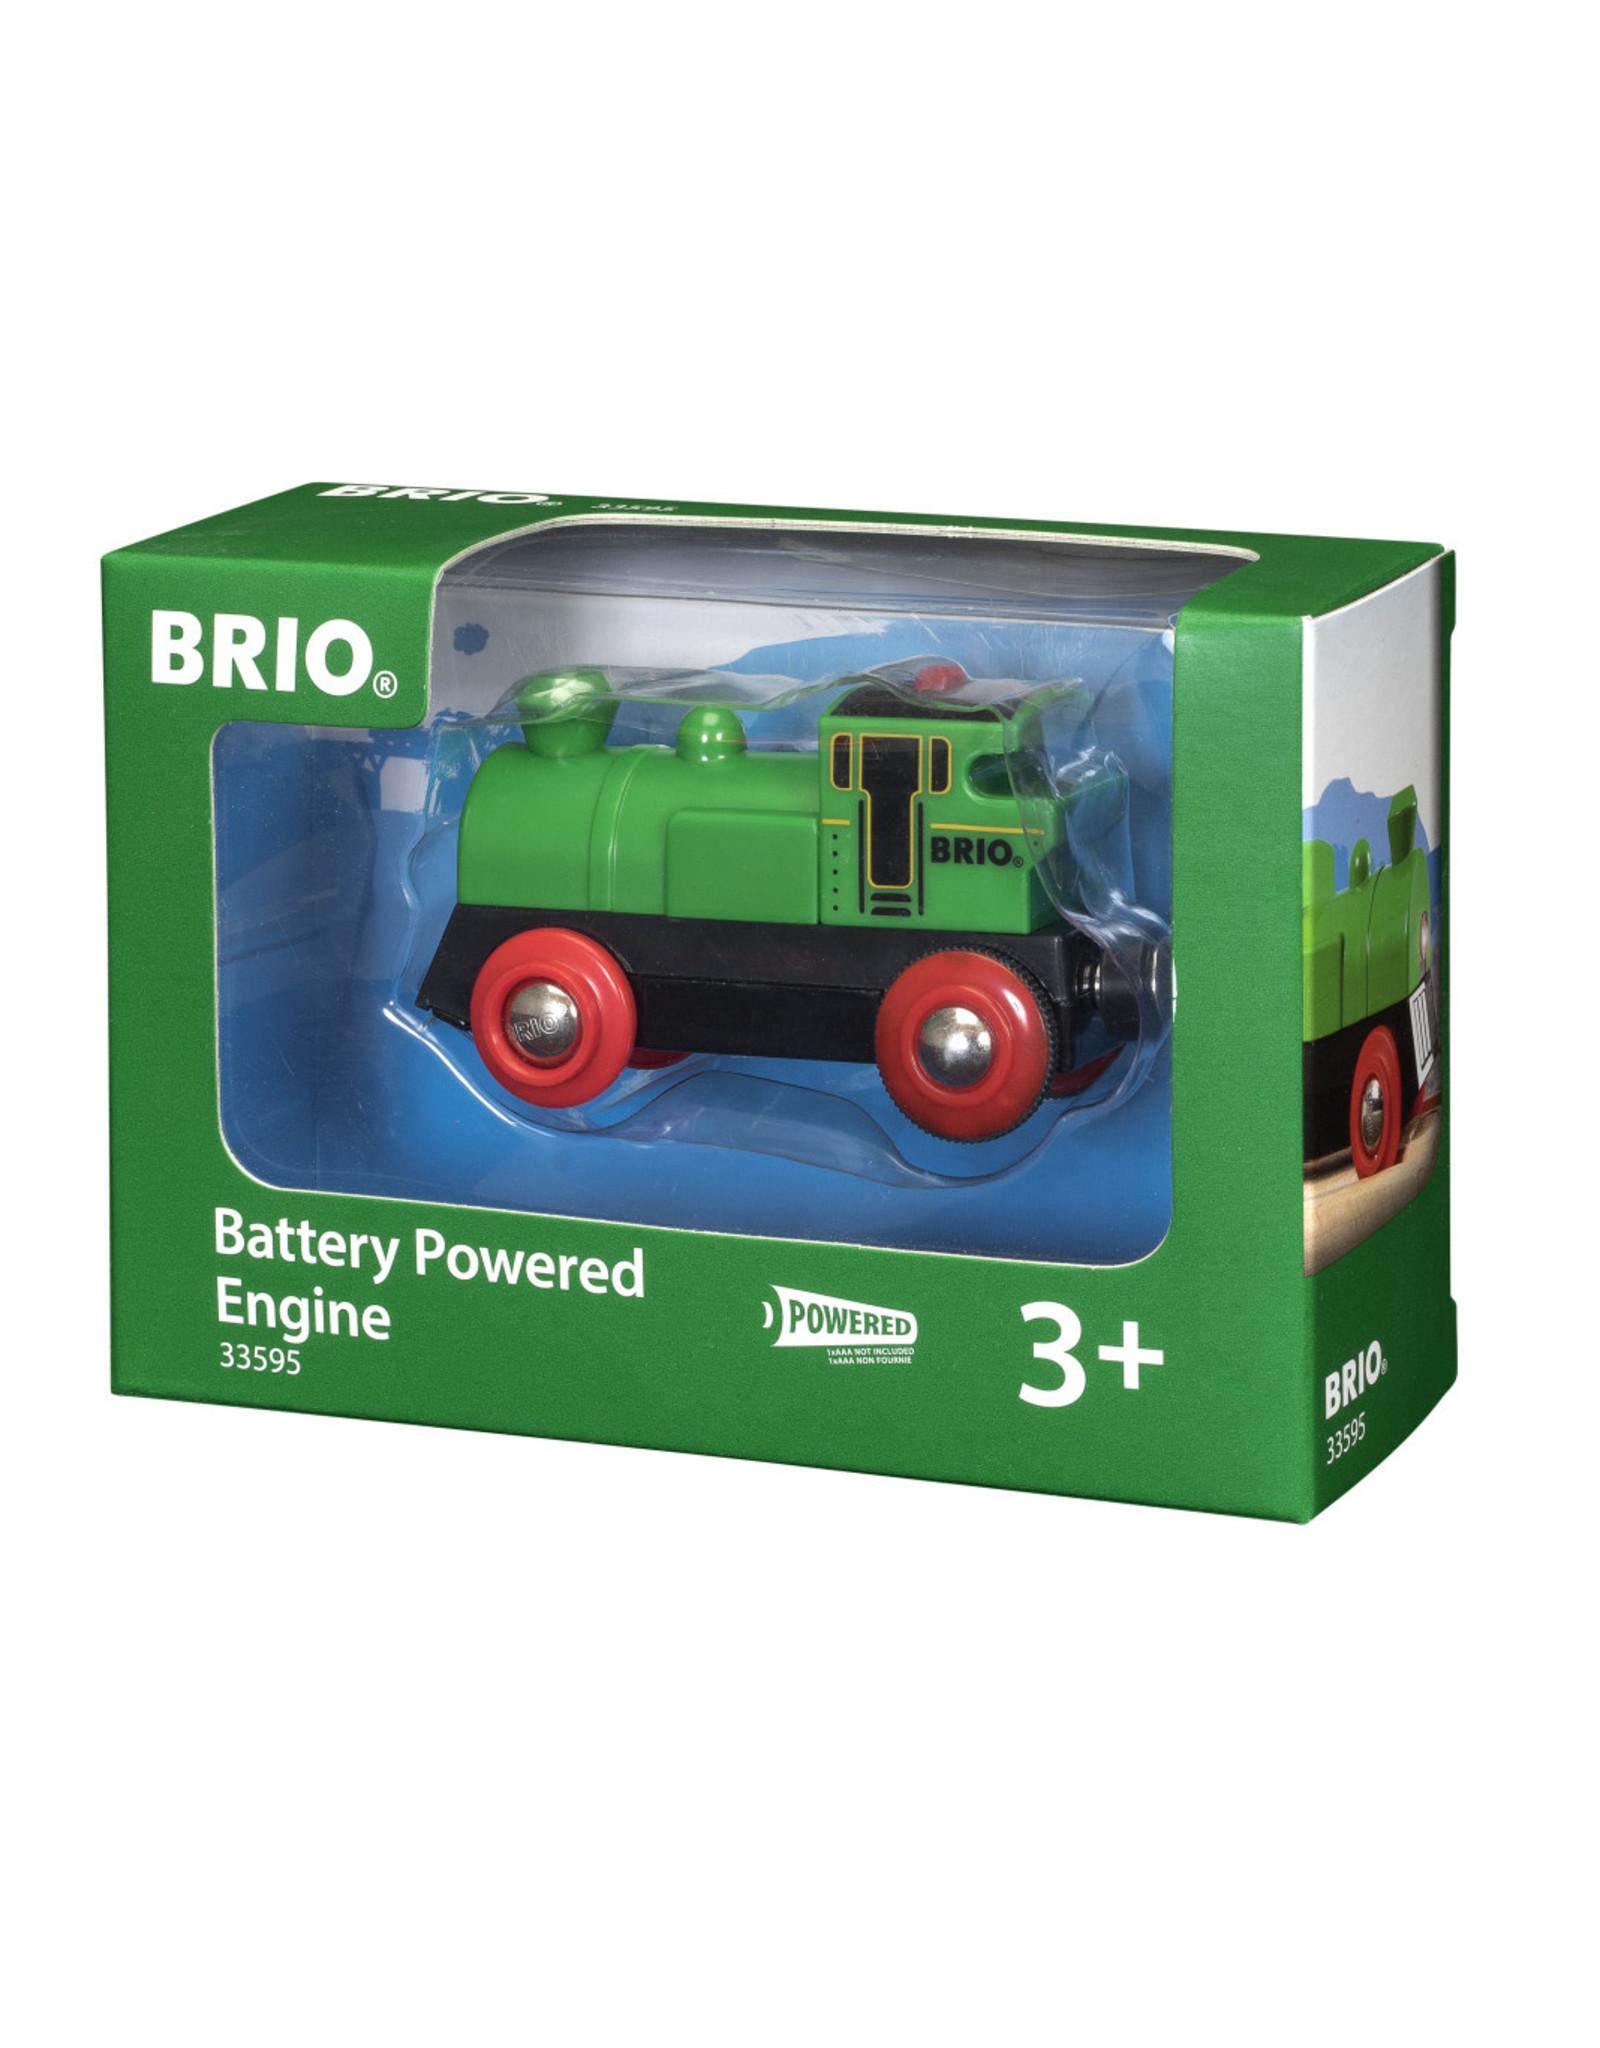 Battery Powered Engine Brio